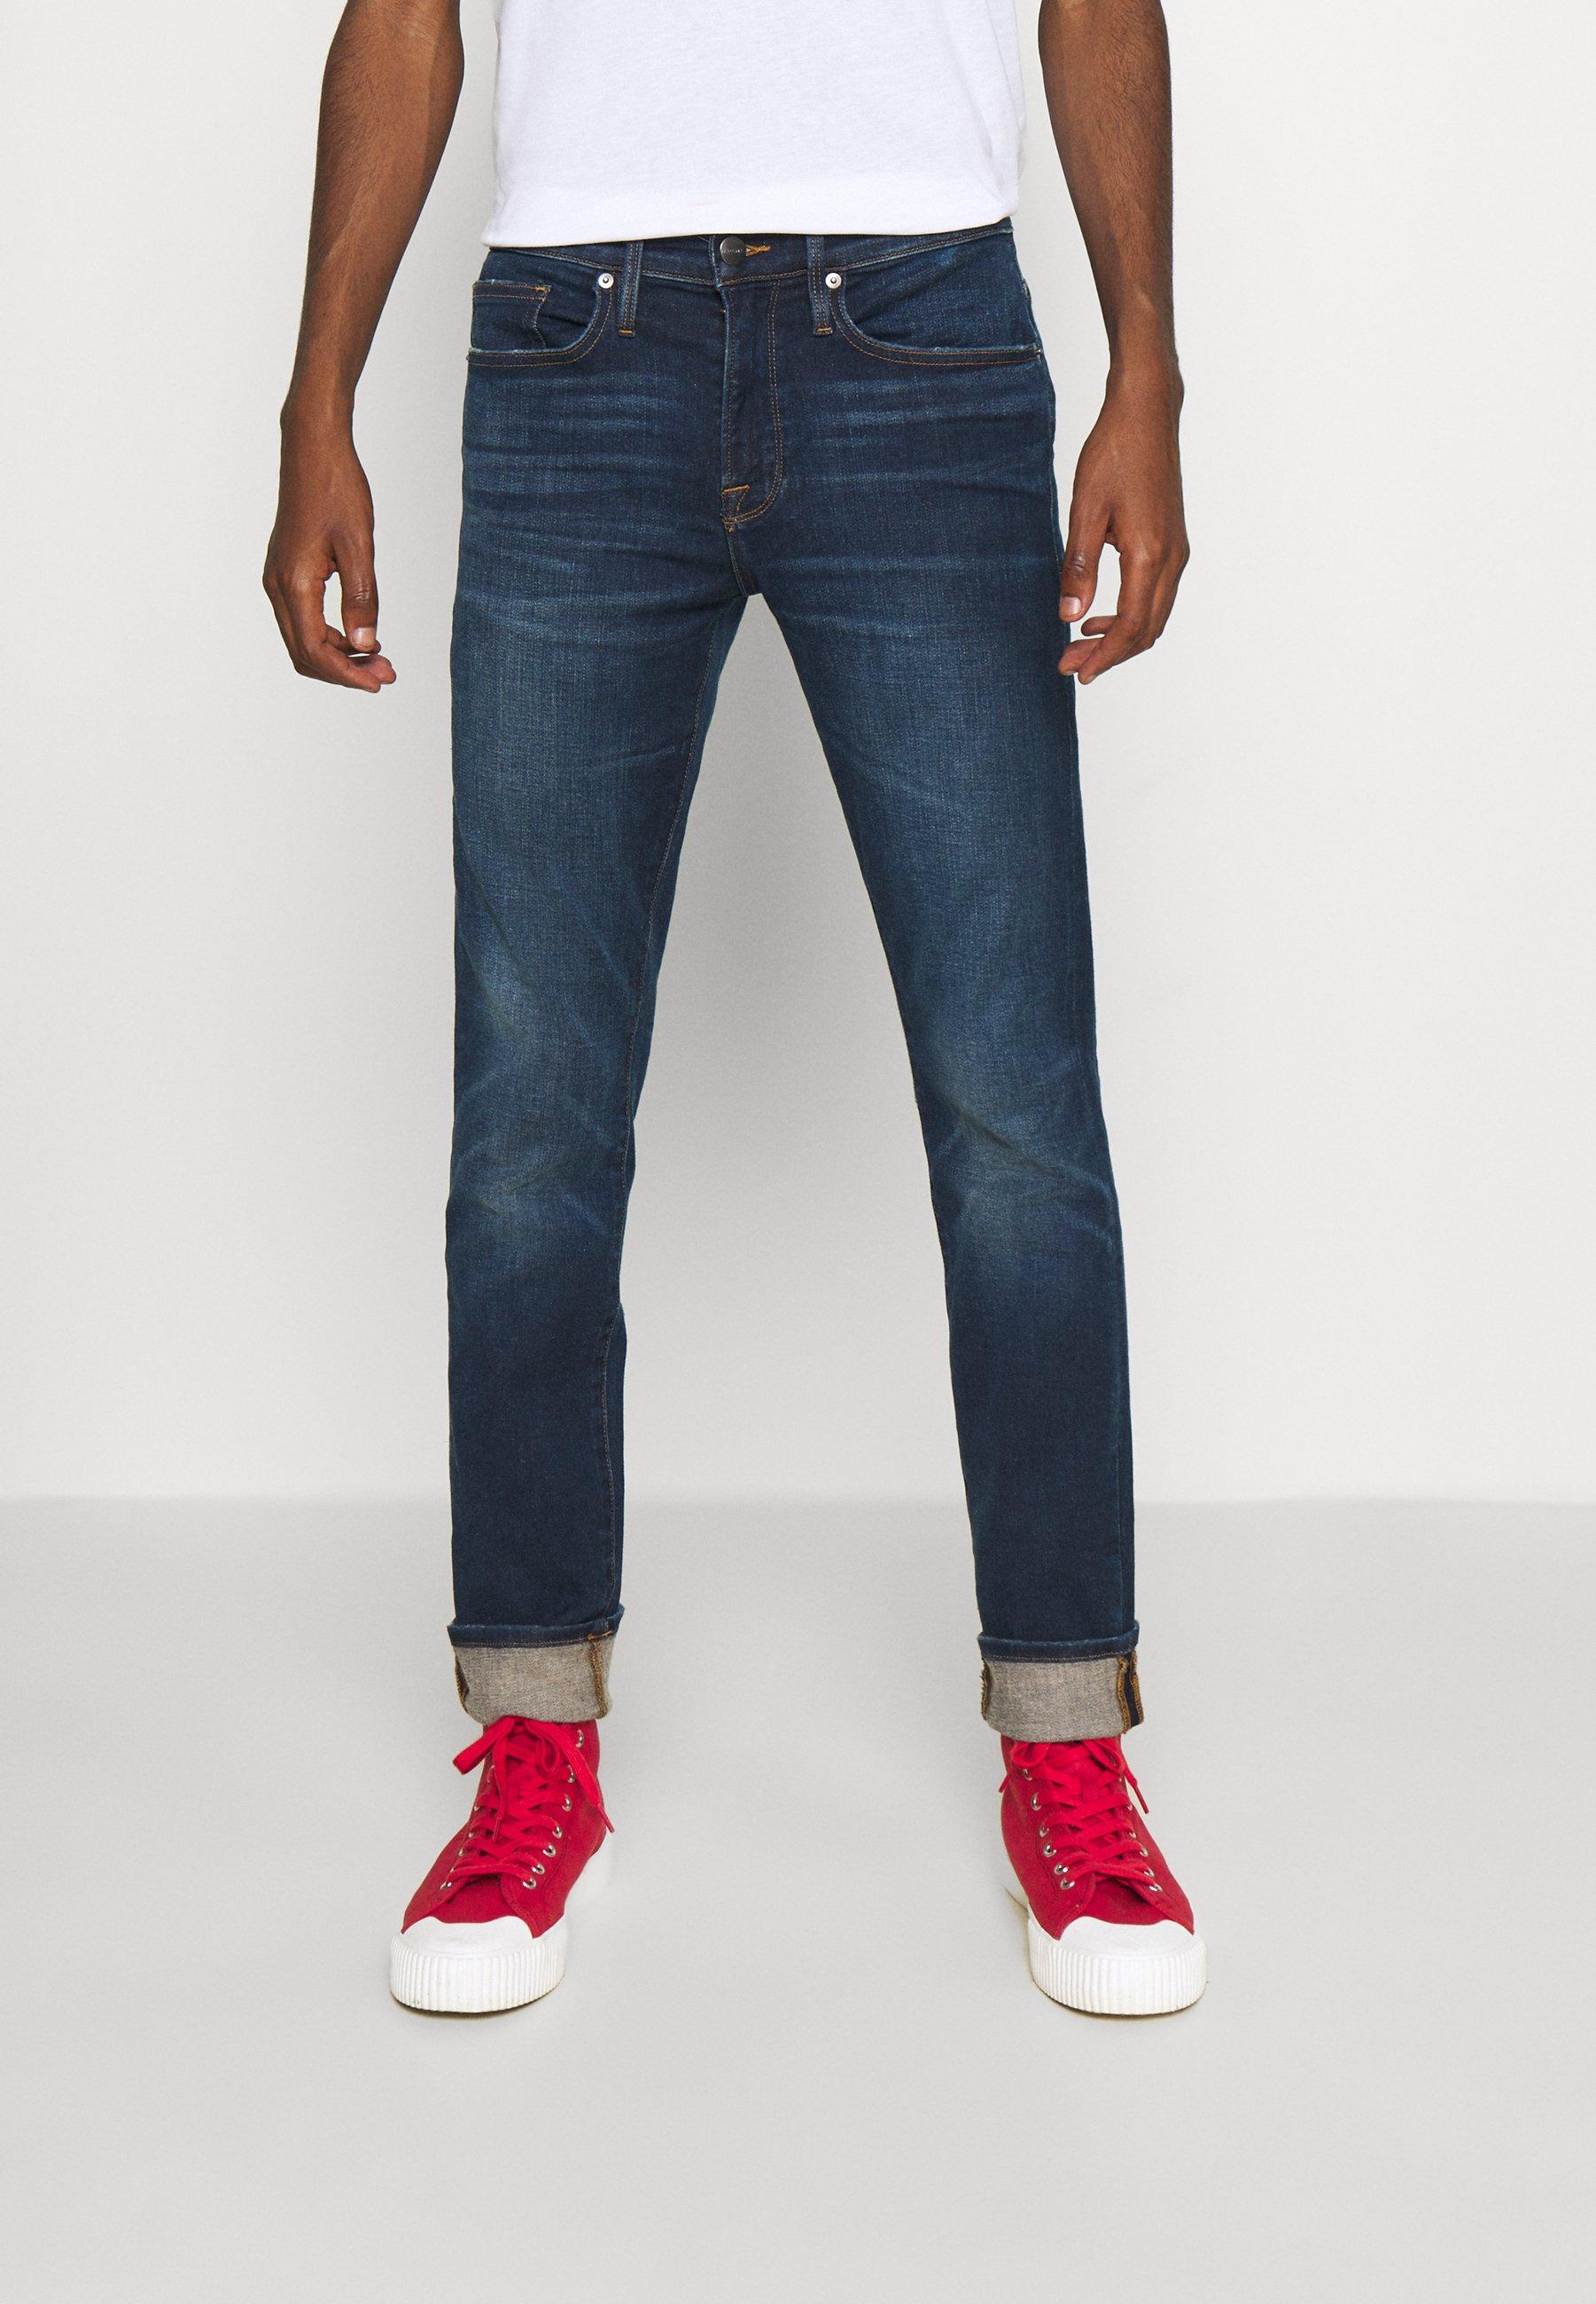 Uomo LHOMME  - Jeans slim fit